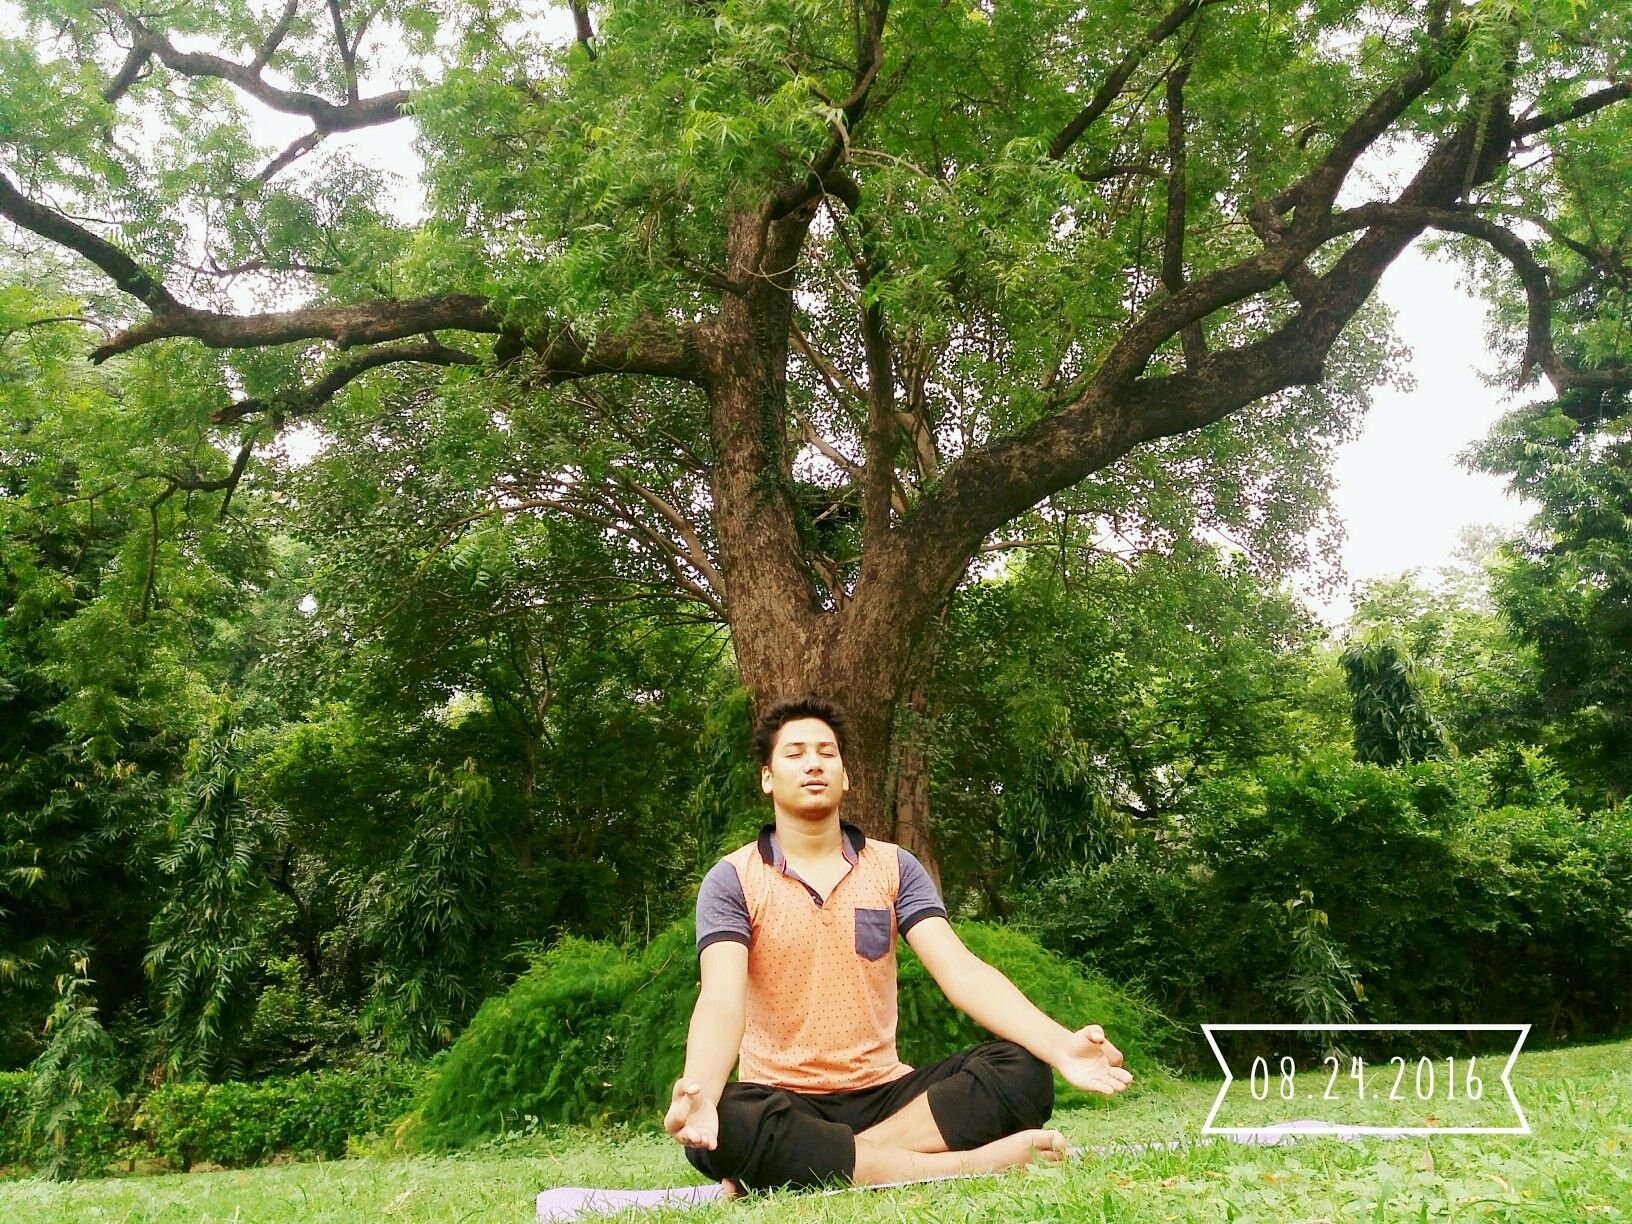 #Meditation #peace